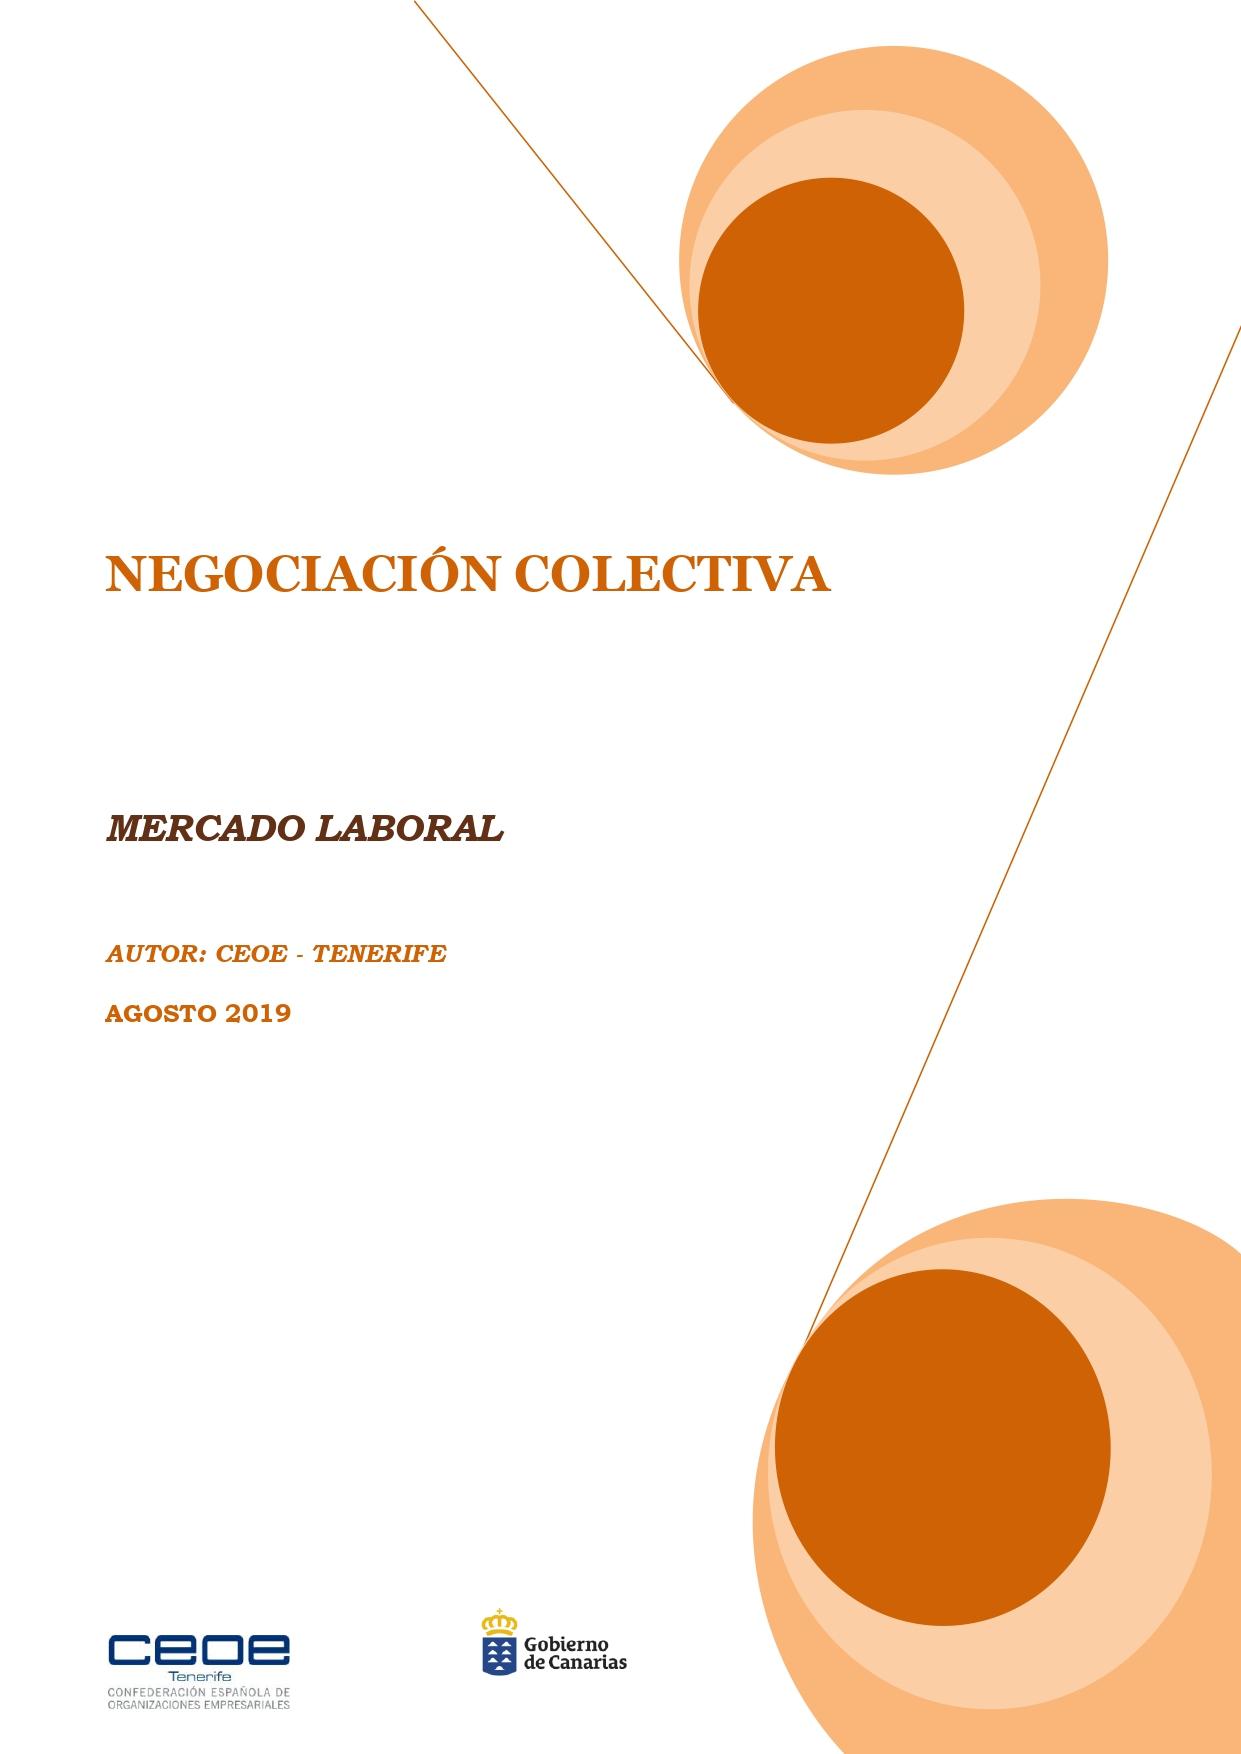 MERCADO LABORAL - NEGOCIACION COLECTIVA AGOSTO